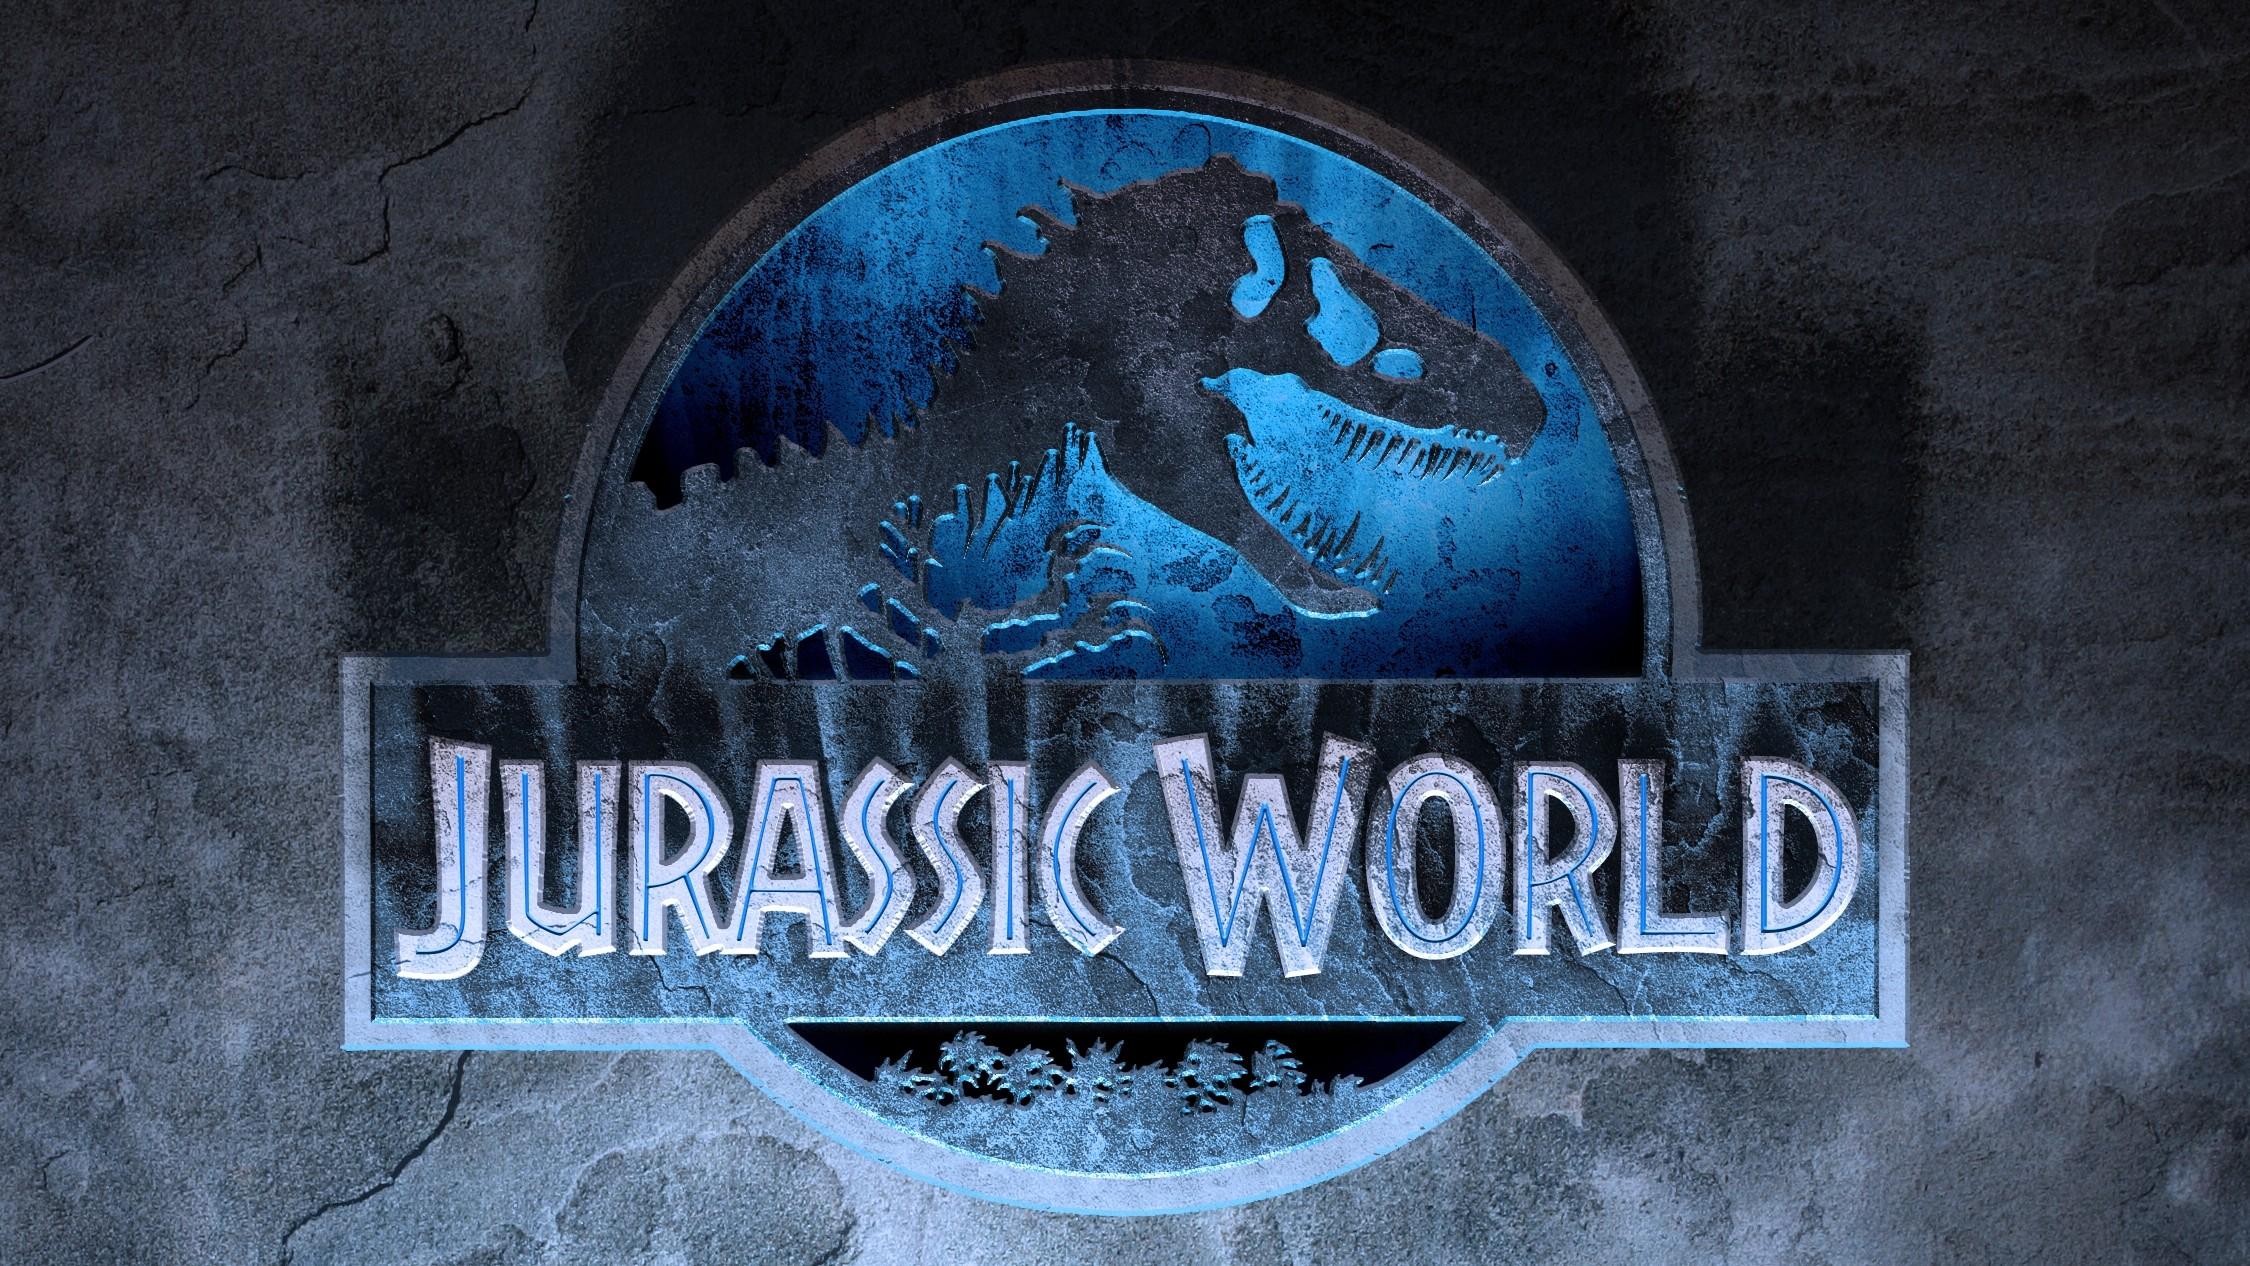 Jurassic World Wallpaper 73 Images